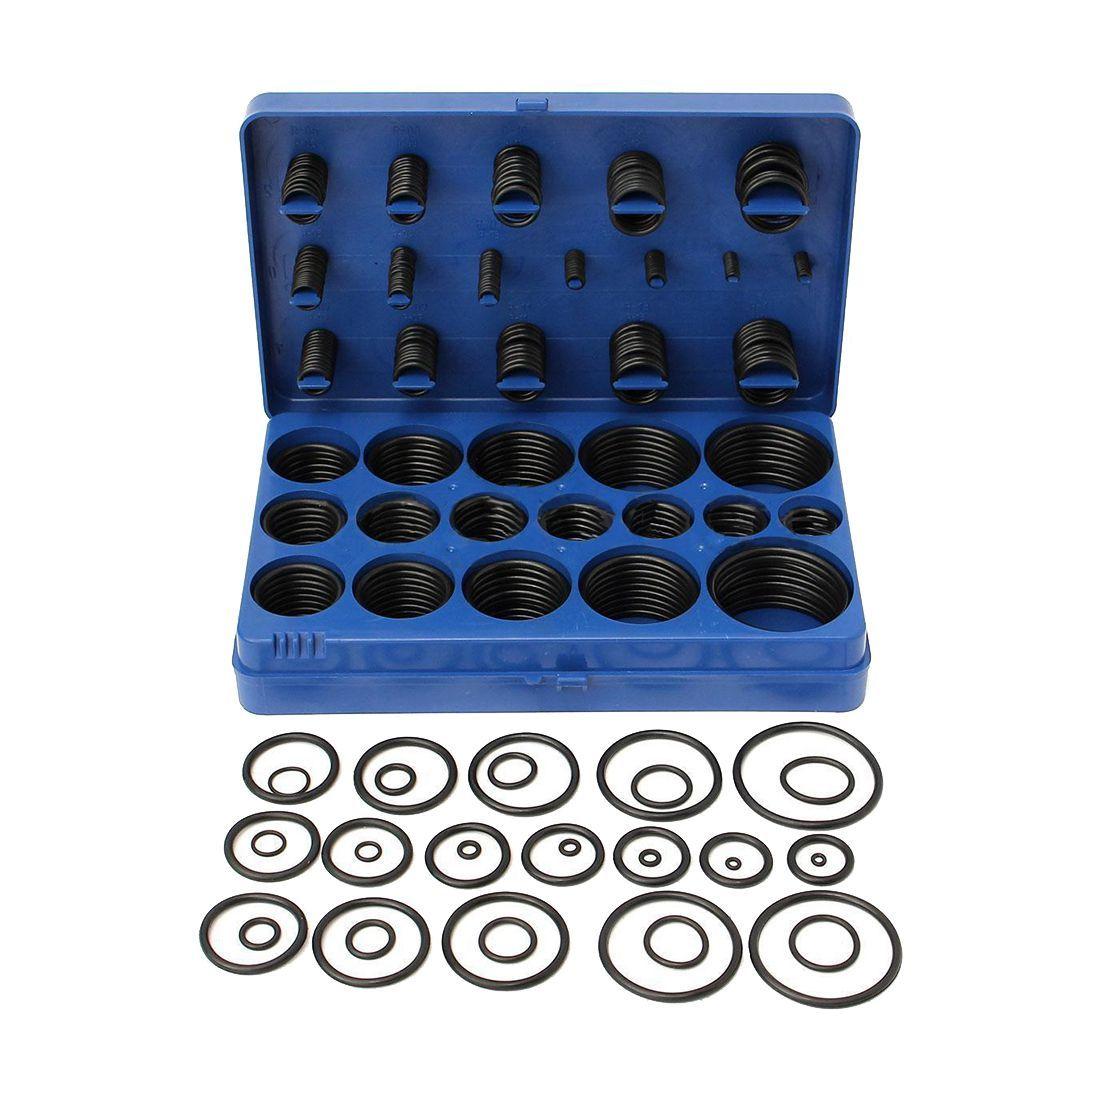 Wholesale 419pcs/lot Rubber O <font><b>Ring</b></font> O-<font><b>Ring</b></font> 32 Sizes Black Washer Gasket Sealing <font><b>Ring</b></font> Assortment Kit With Case